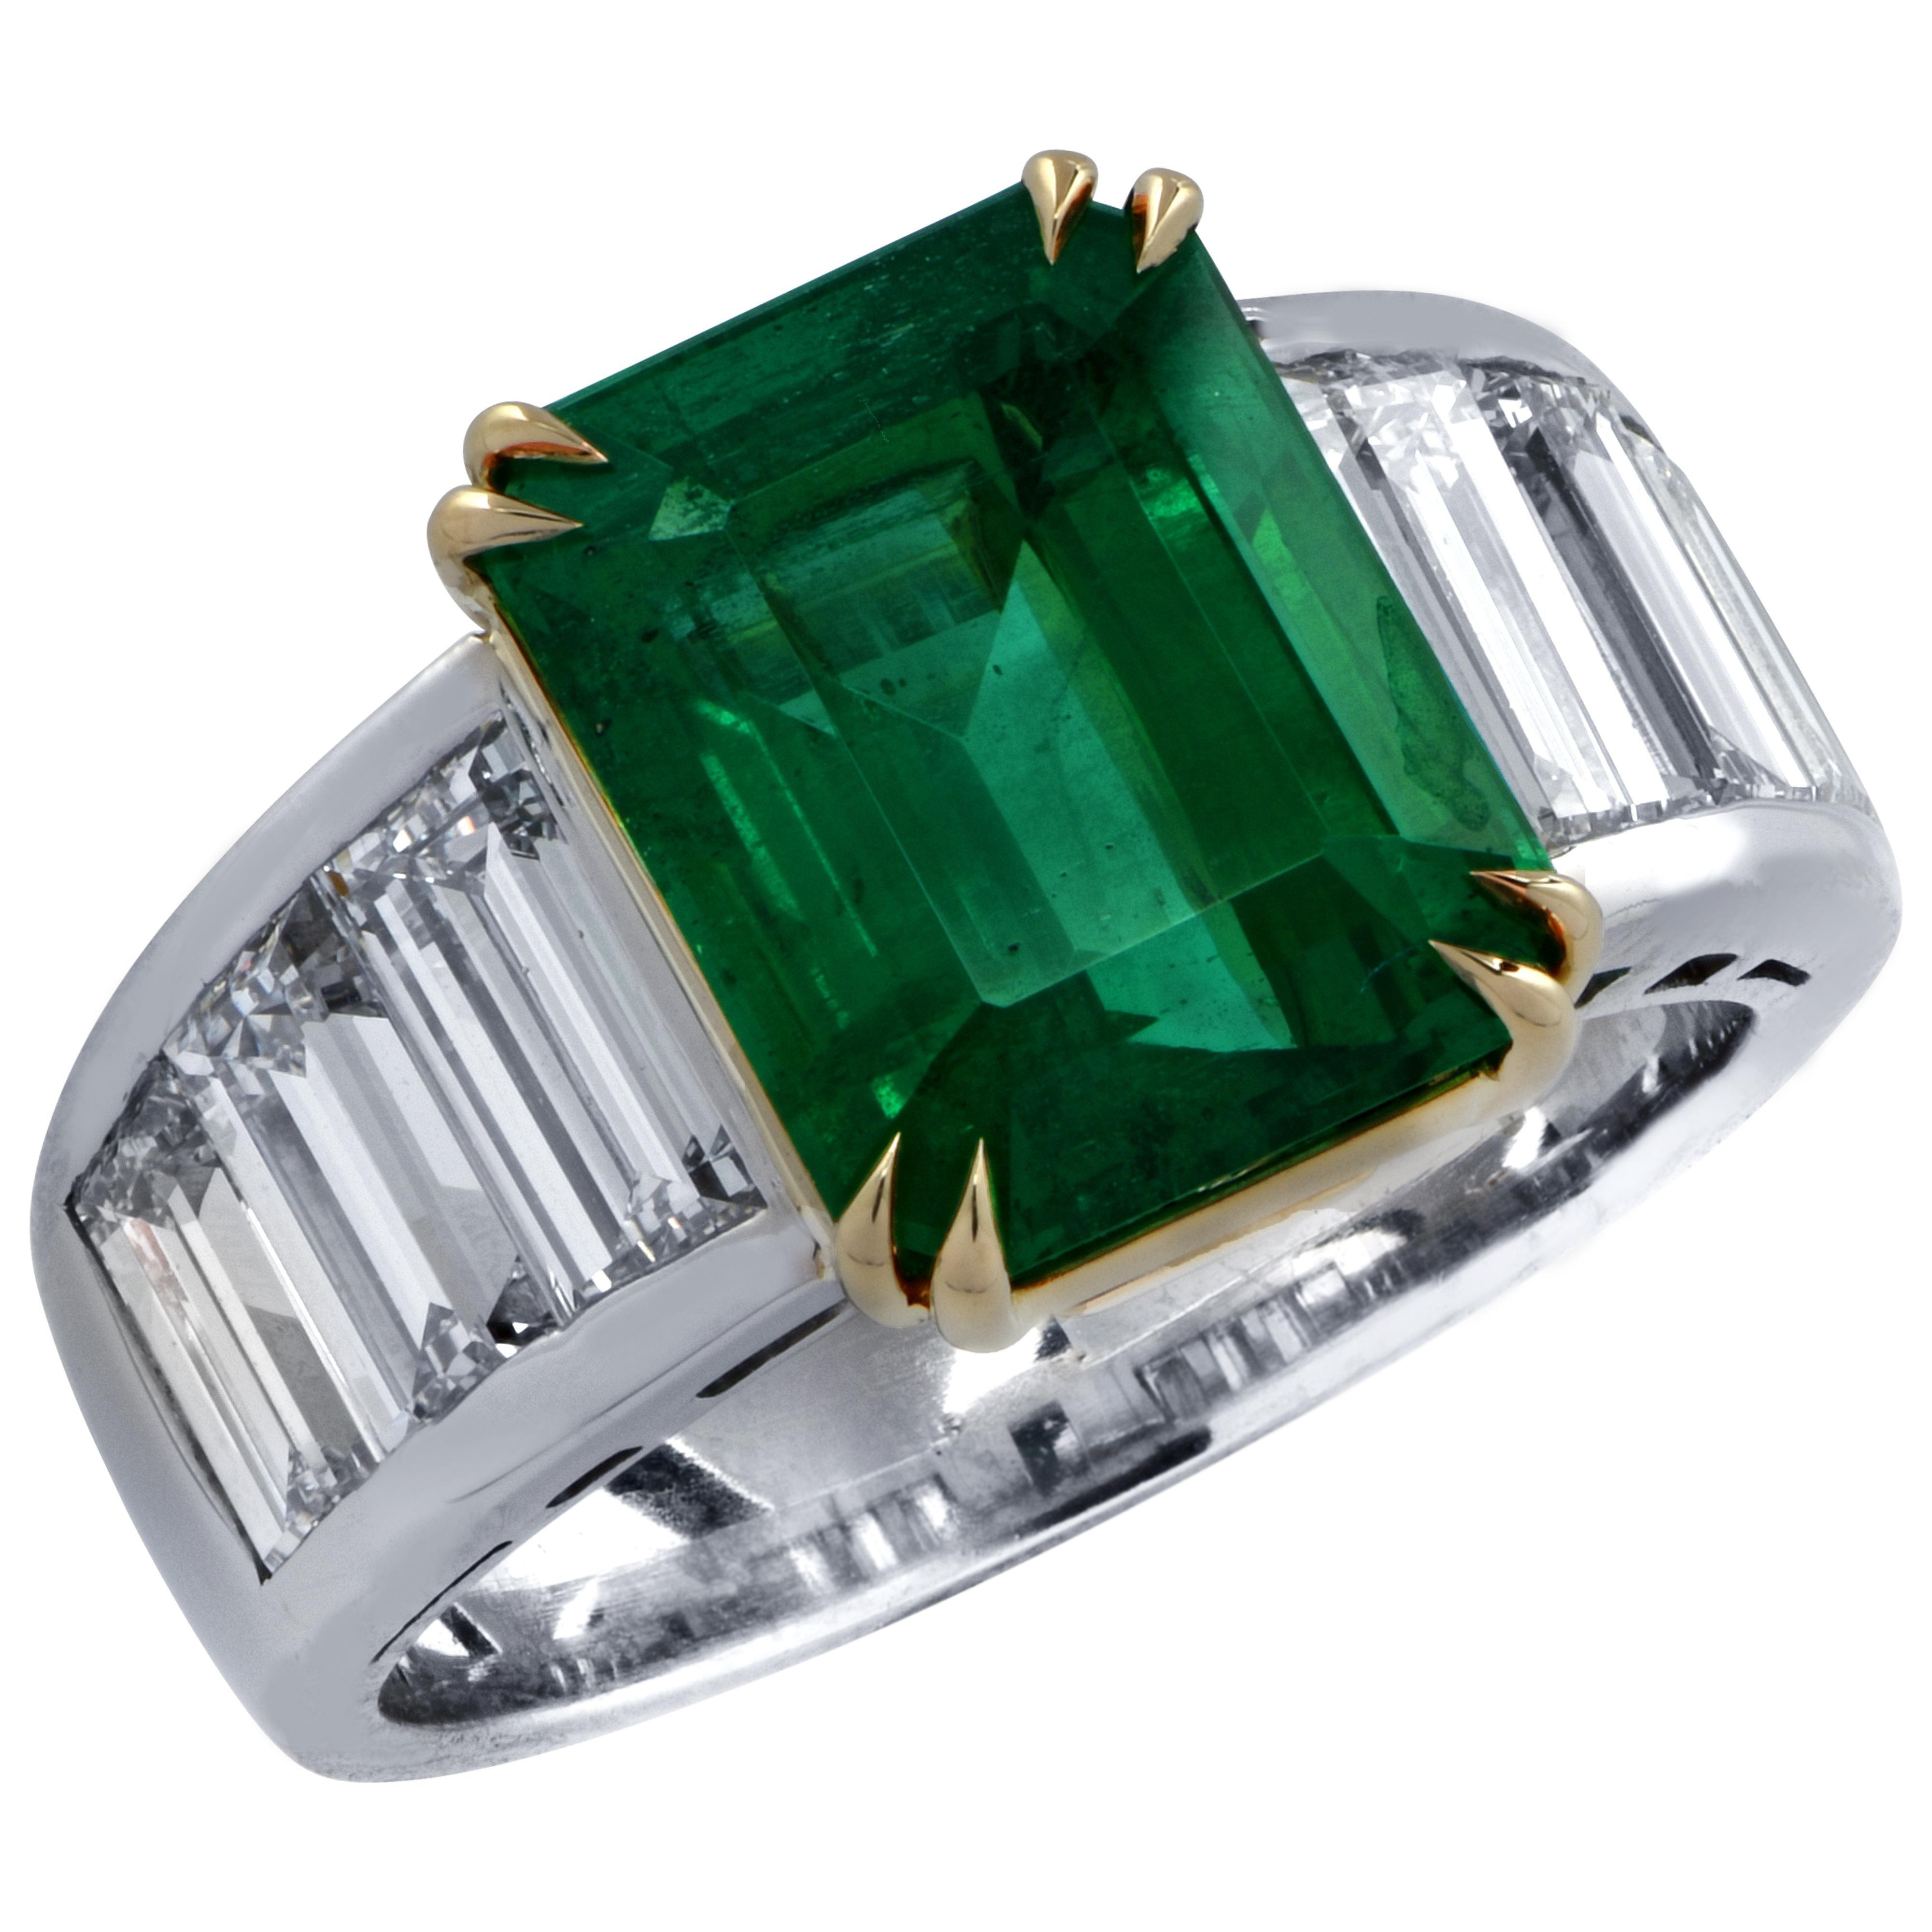 Vivid Diamonds Certified 4.87 Carat Emerald and Diamond Ring